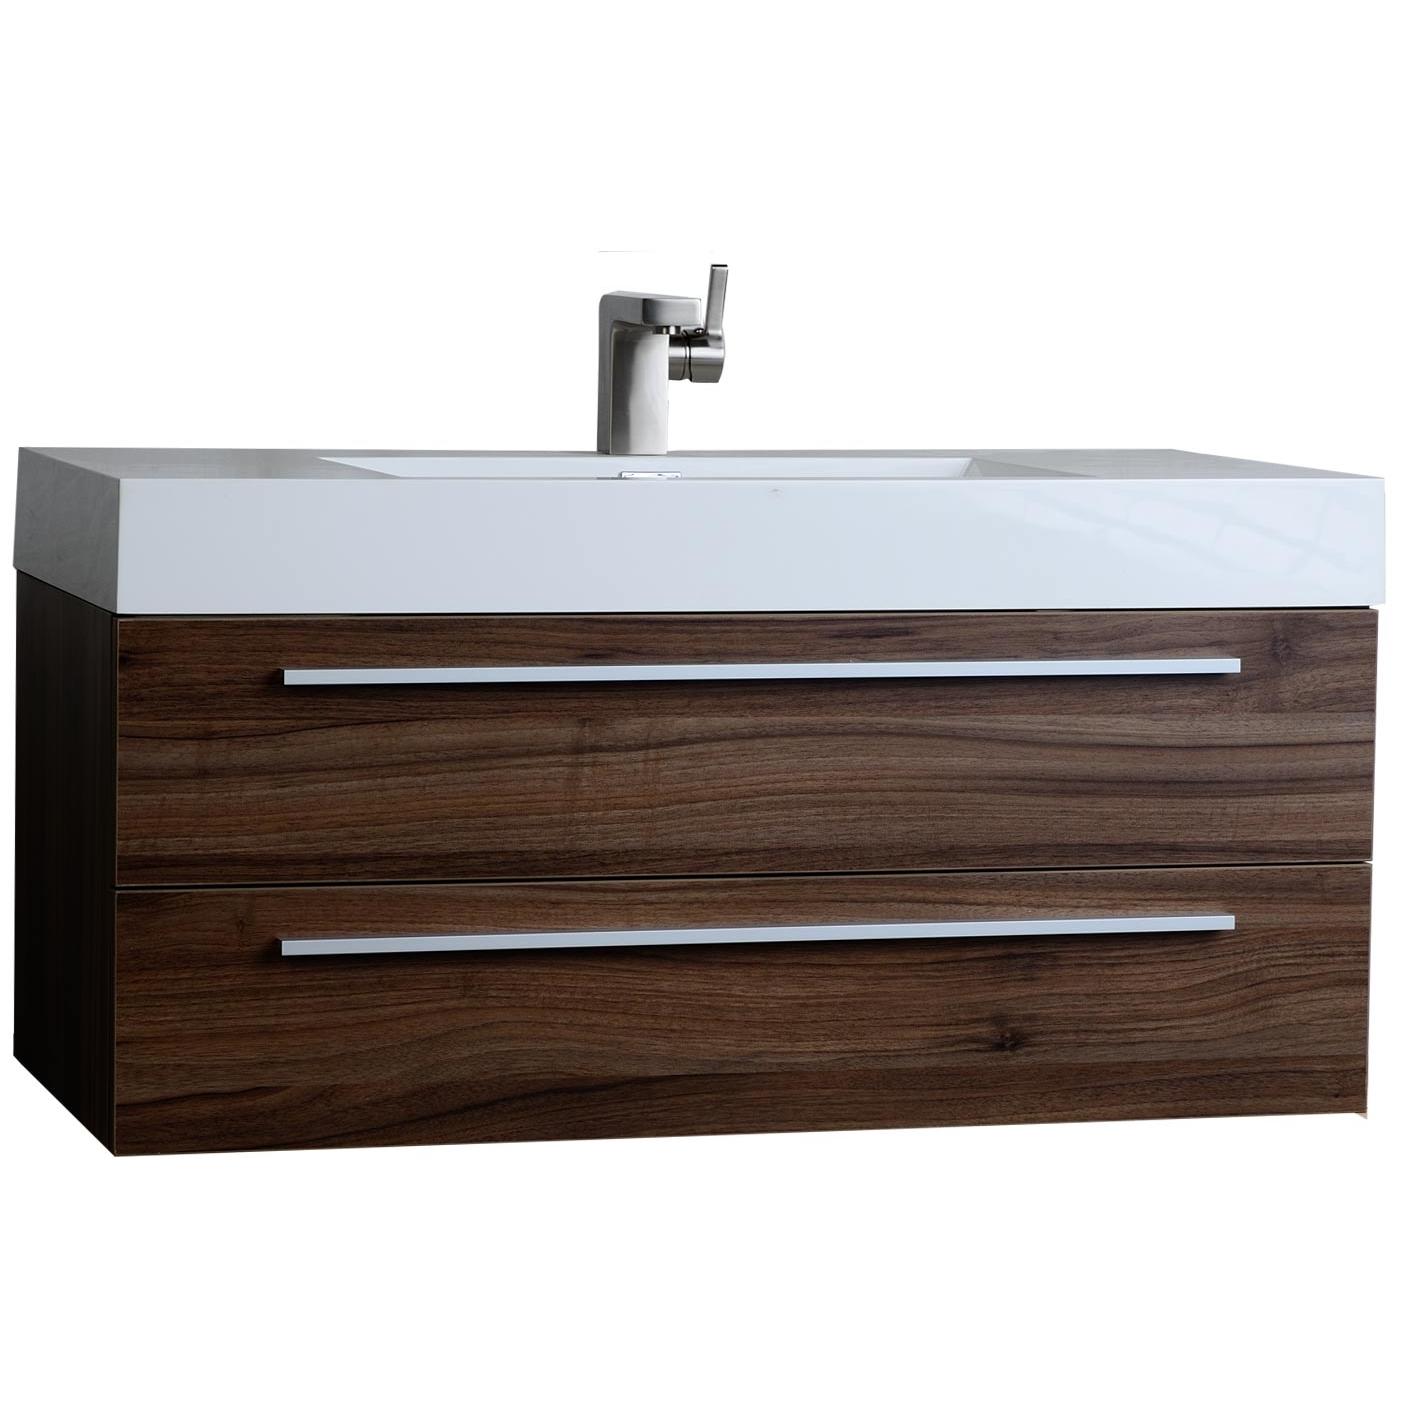 Buy 39 25 Inch Contemporary Bathroom Vanity Walnut Tn T1000 Wn On Conceptbaths Com